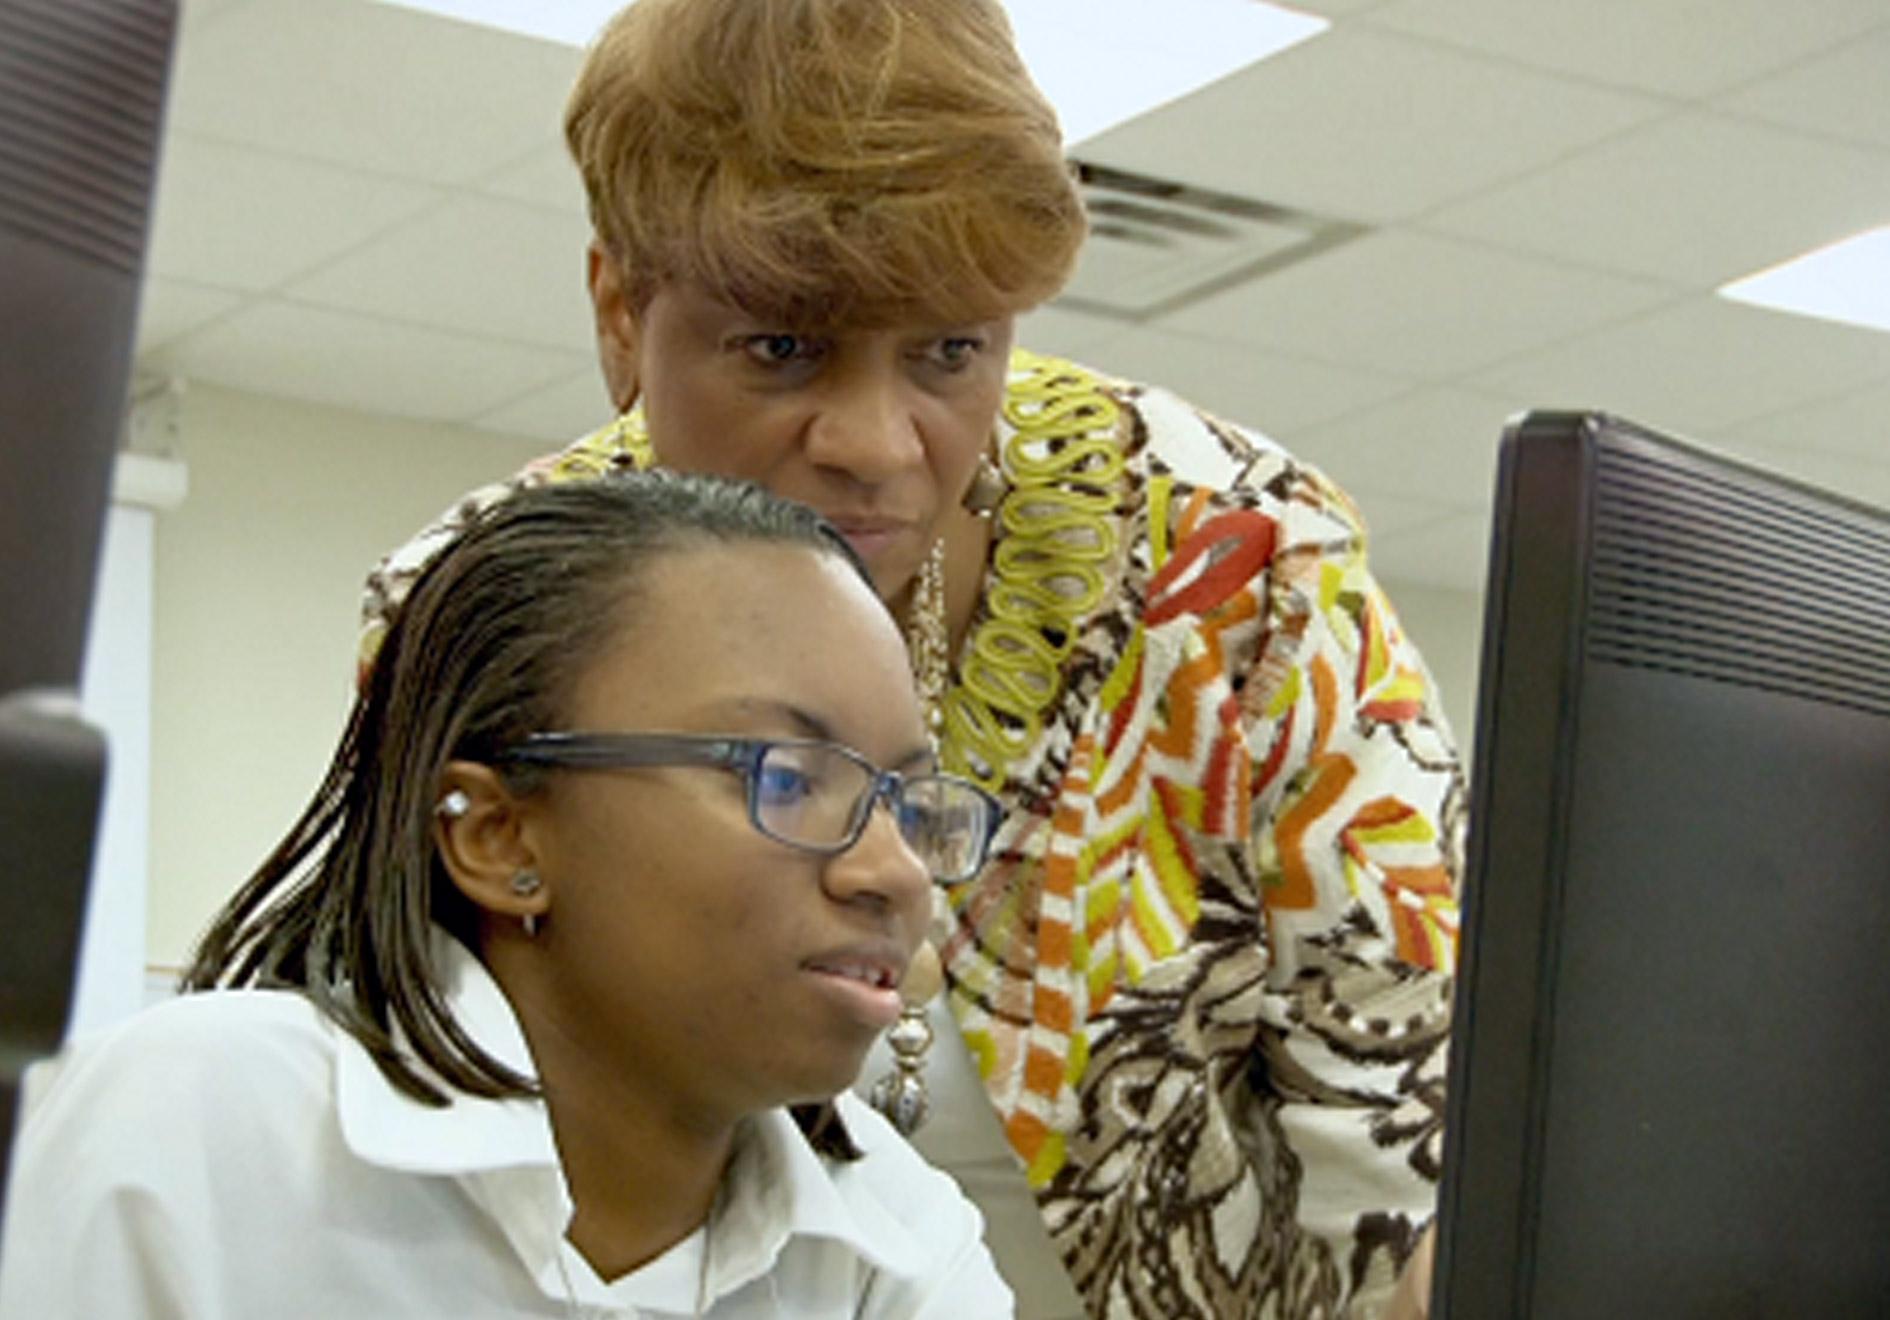 Janice Stewart Helps Student